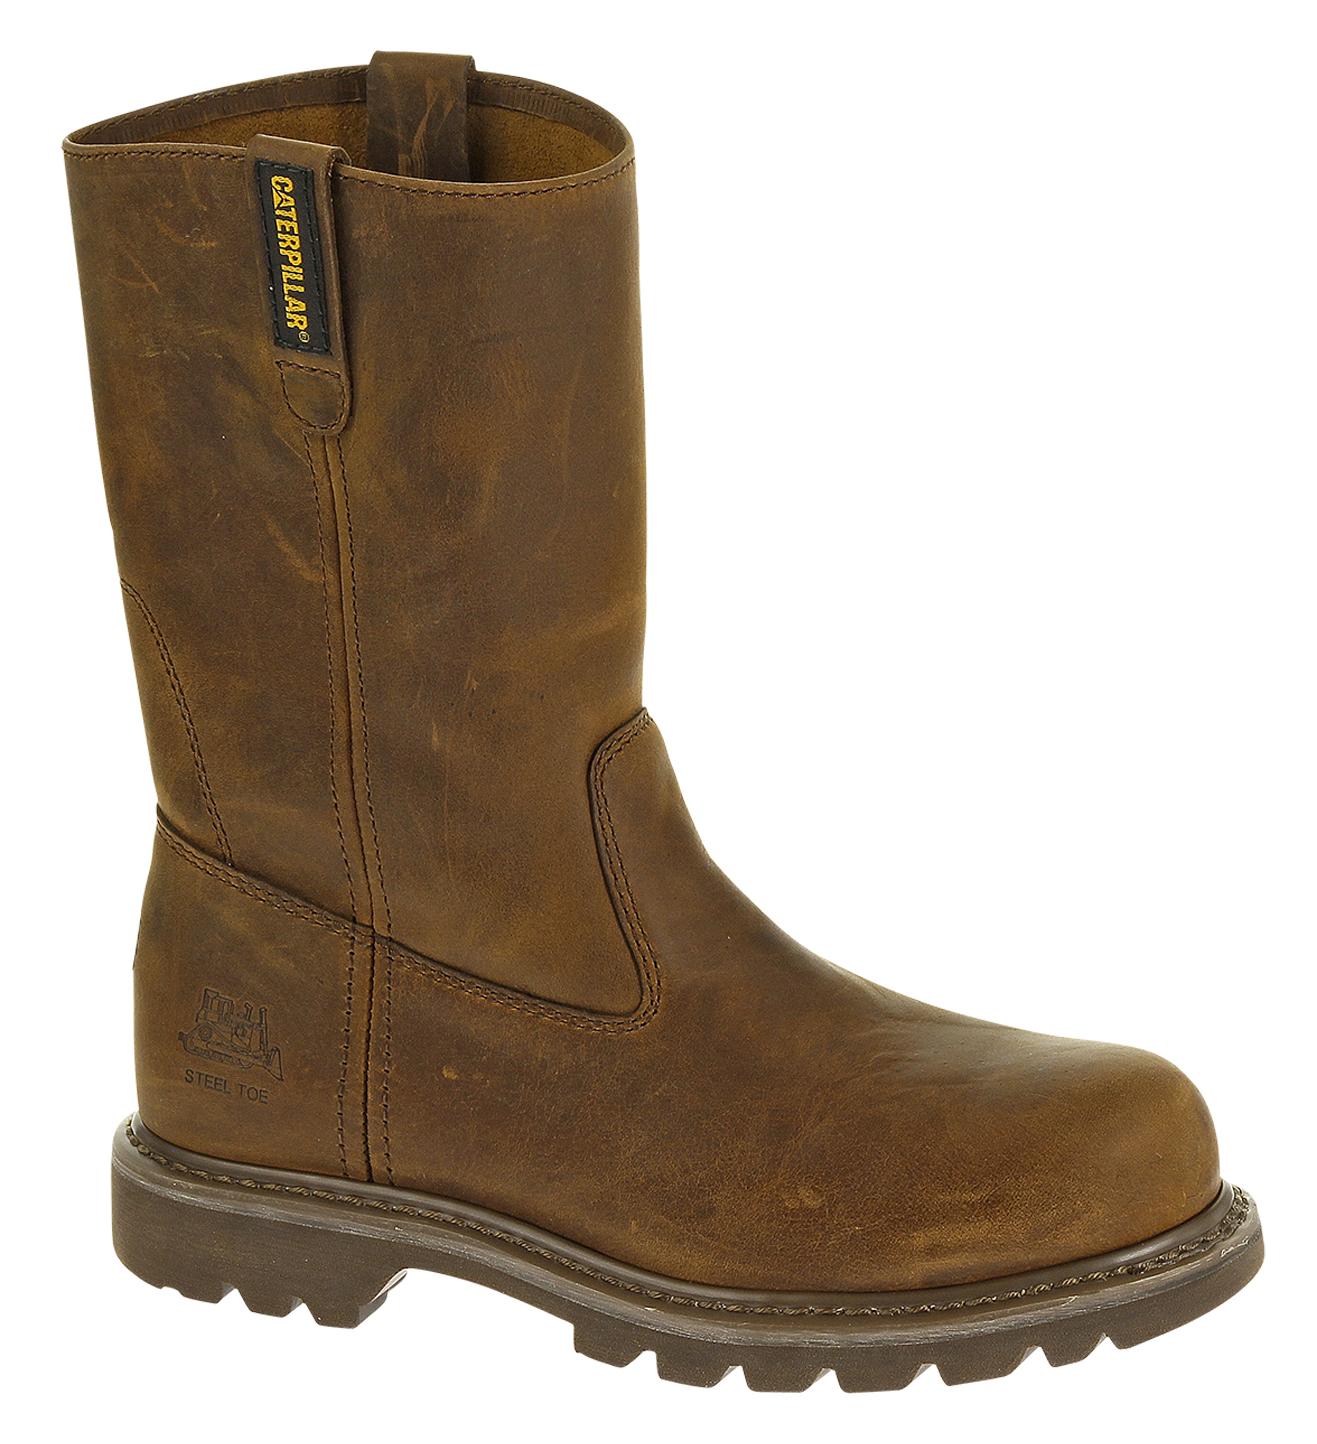 Revolver Work Boots - Steel Toe